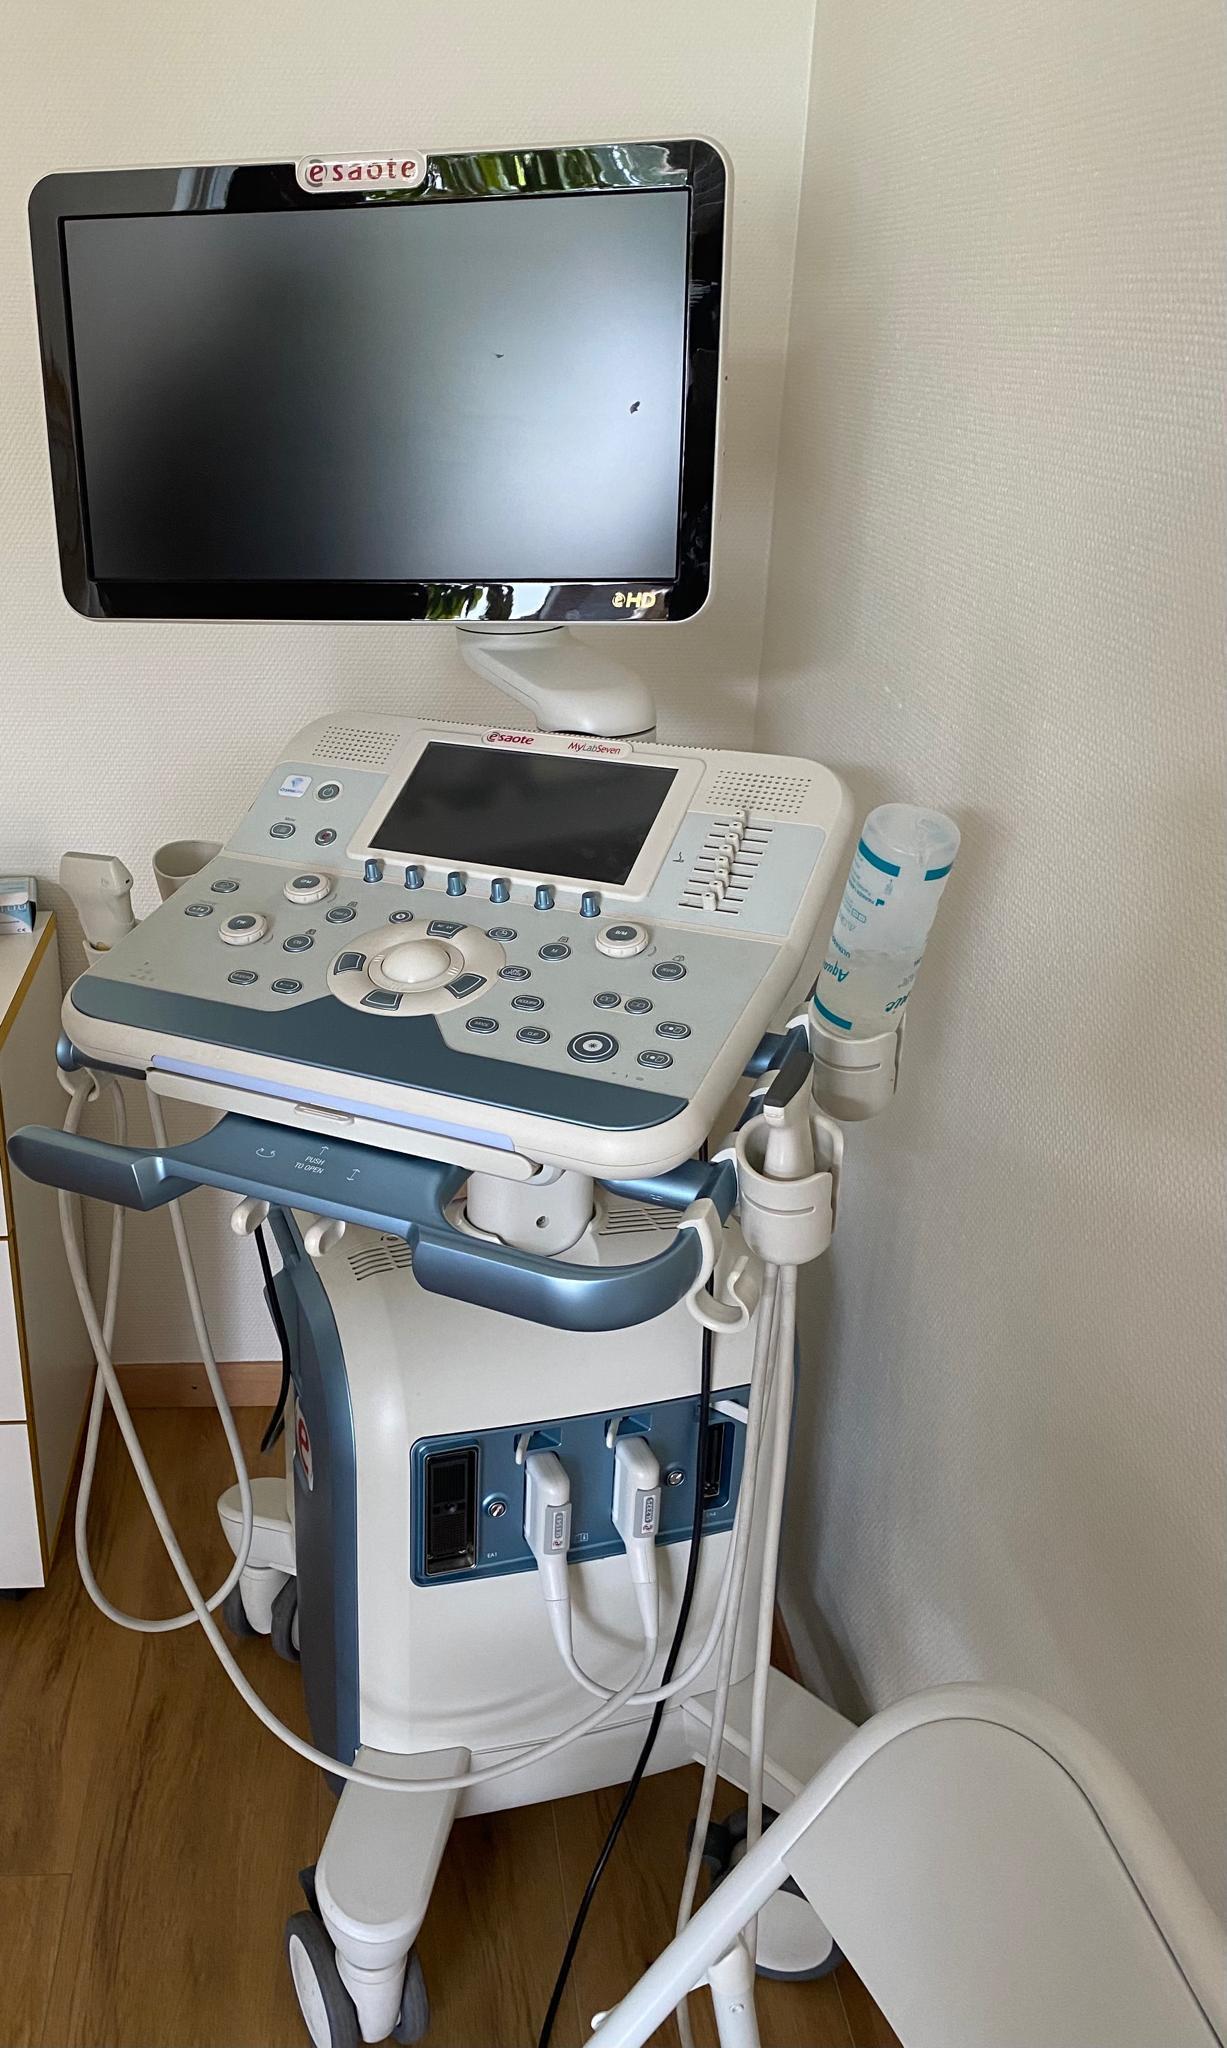 Occasion Ultraschallgerät Esaote MyLab Seven CrxstalLine